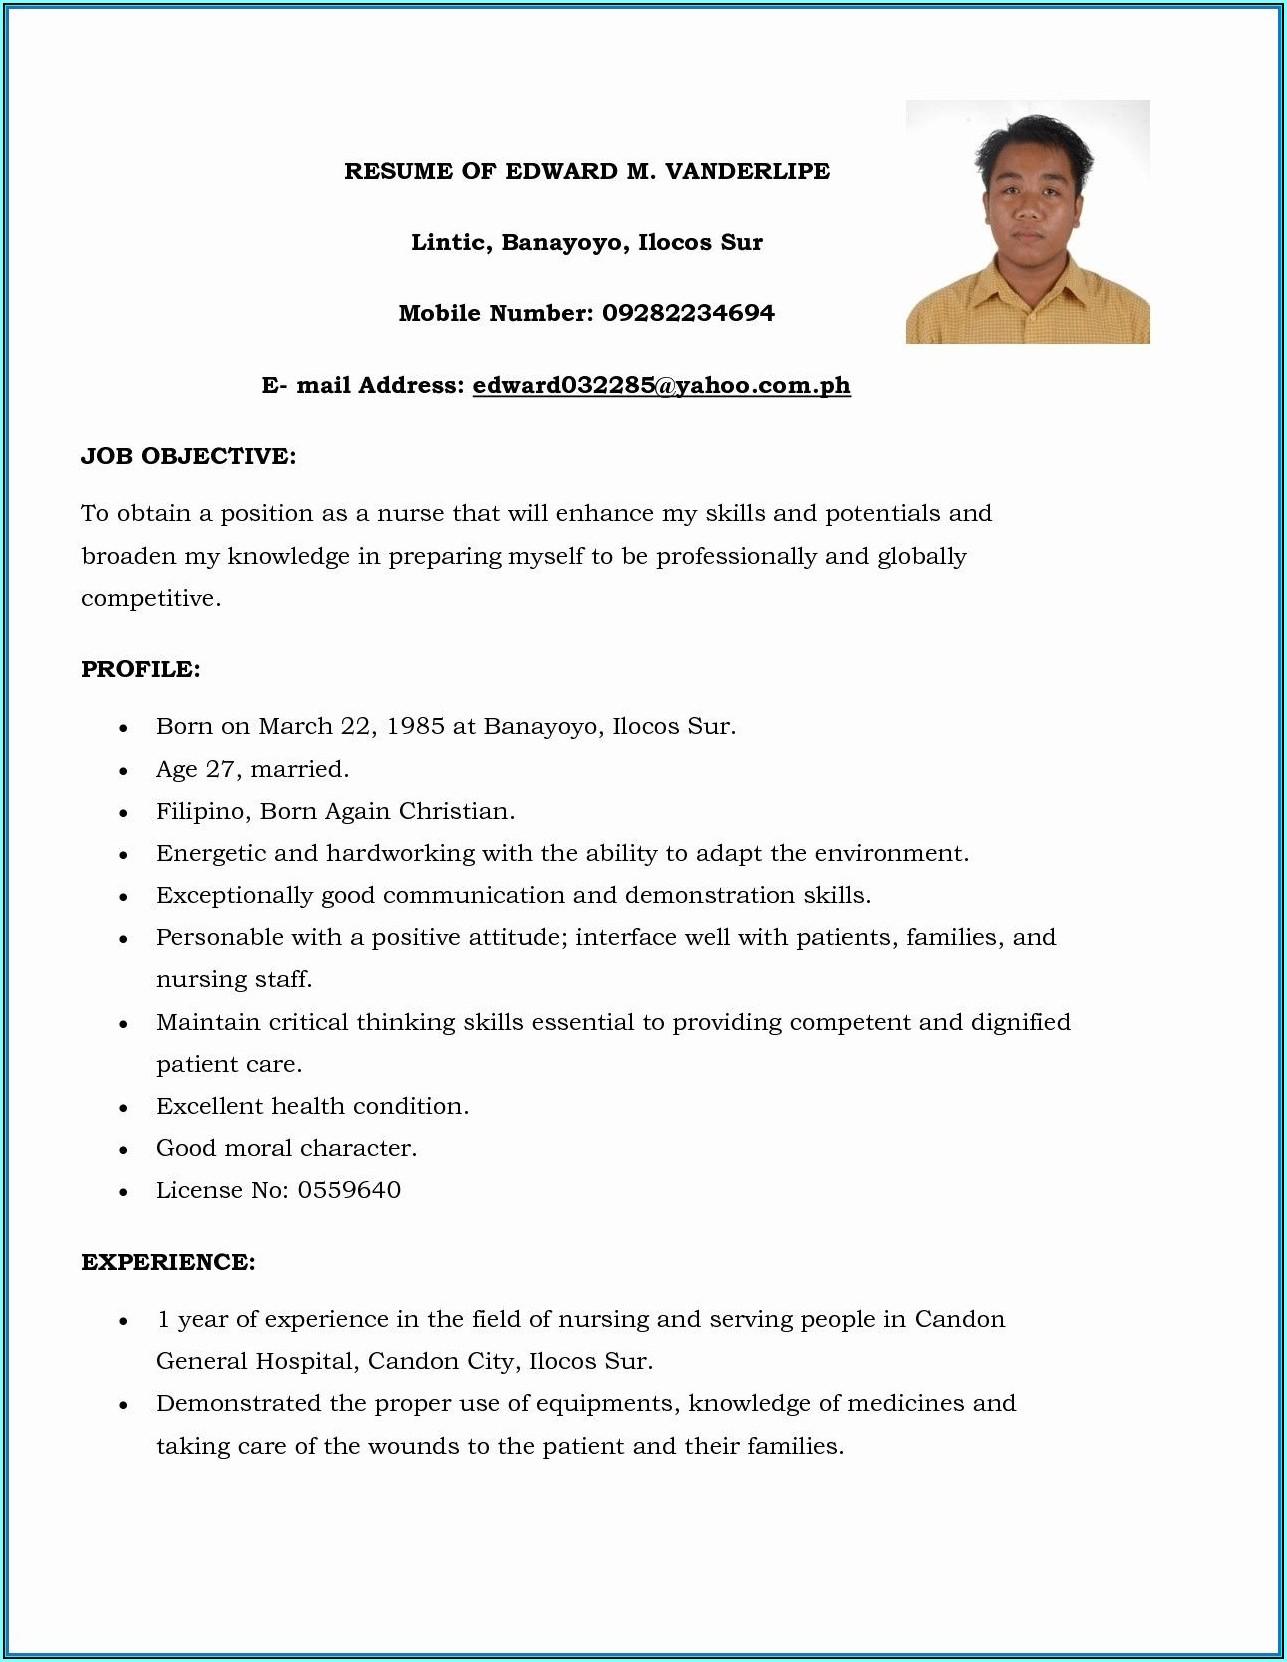 Resume Format For Nursing Staff